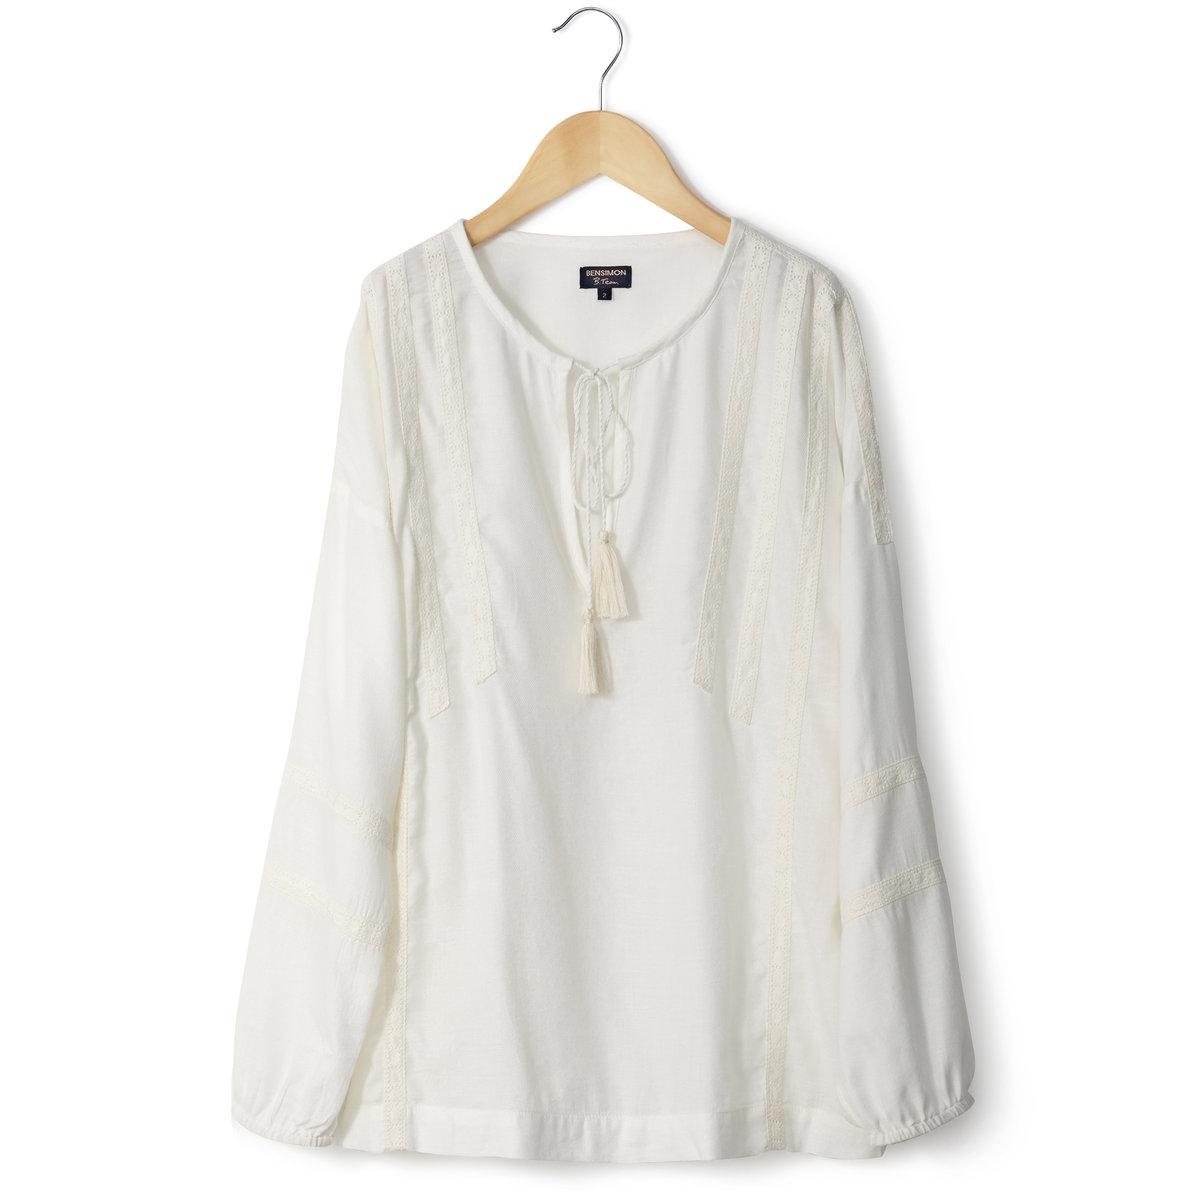 Блузка из крепаБлузка BENSIMON. Блузка из крепа, 100% шерсти. Длинные рукава. Круглый вырез, застежка на шнурок с 2 помпонами. Галуны с вышивкой в тон спереди и на рукавах.<br><br>Цвет: экрю<br>Размер: 2(M)